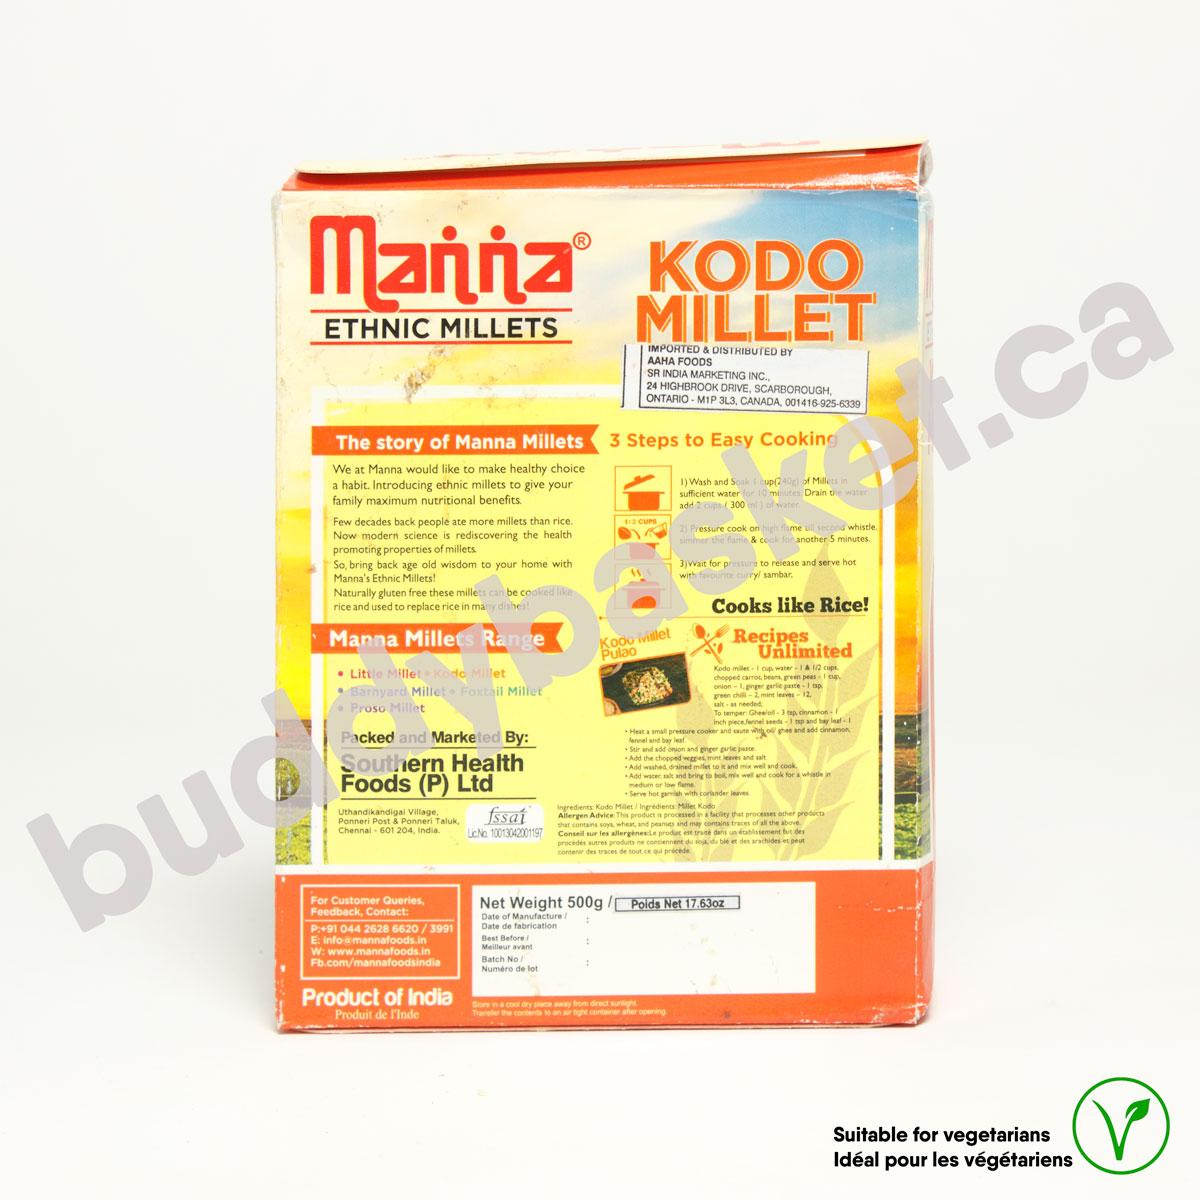 Manna Kodo Millet (Varagu) 500g